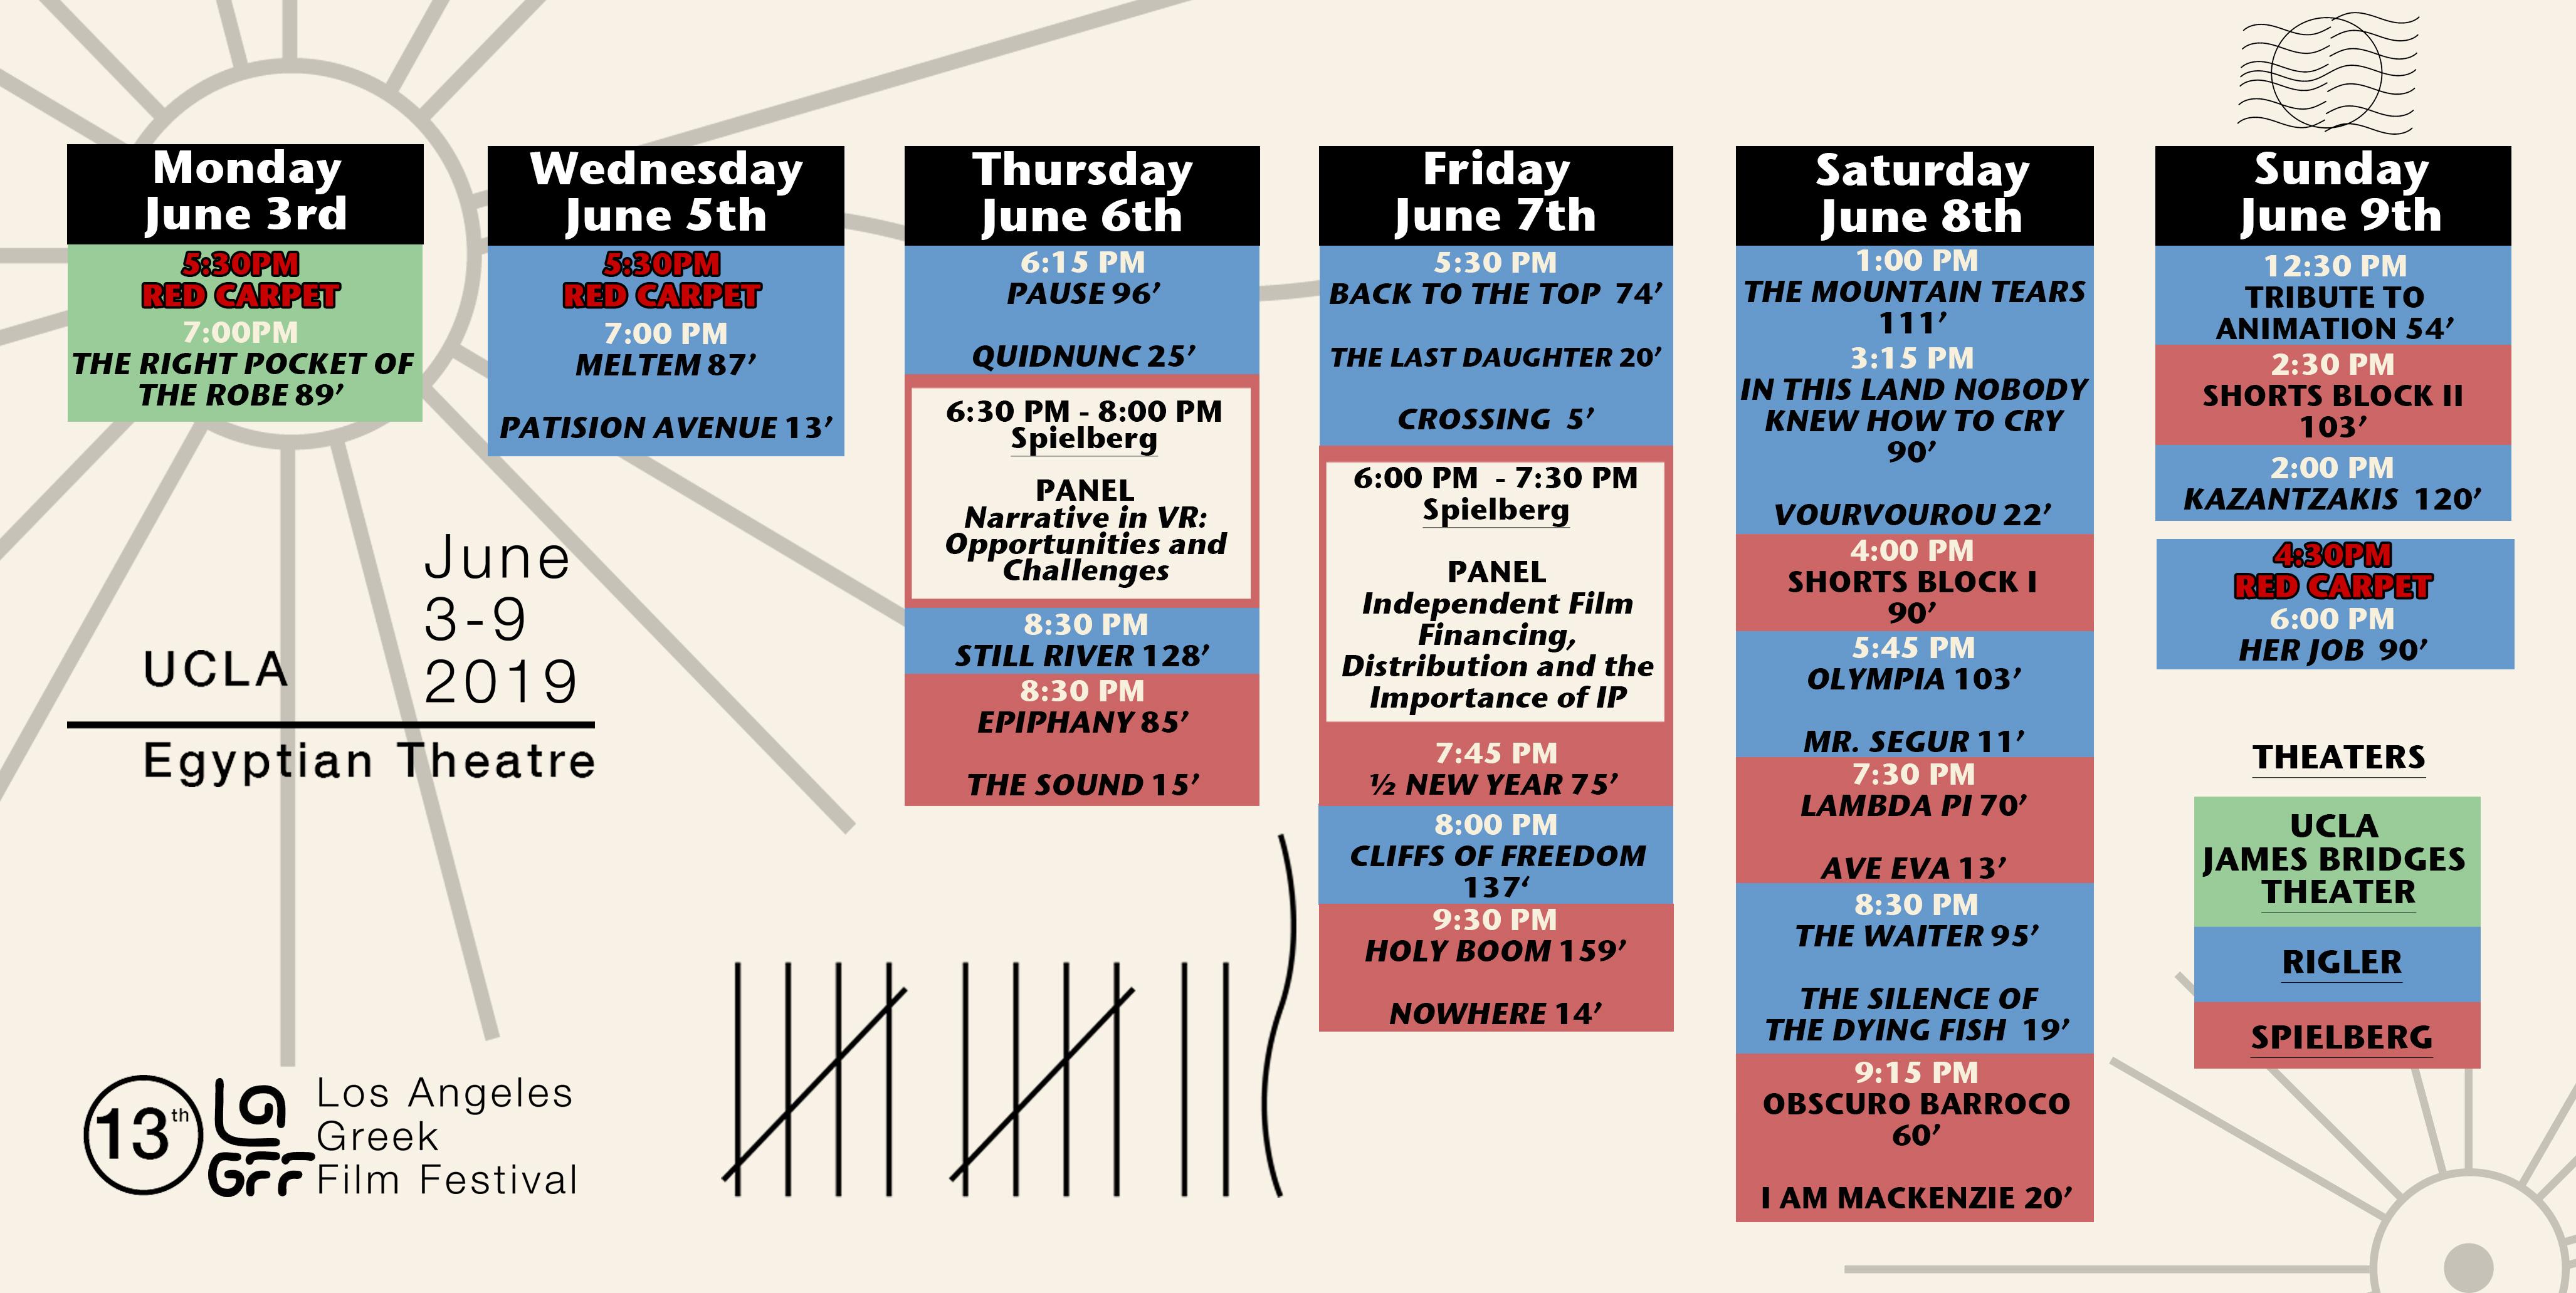 SCHEDULE - Los Angeles Greek Film Festival